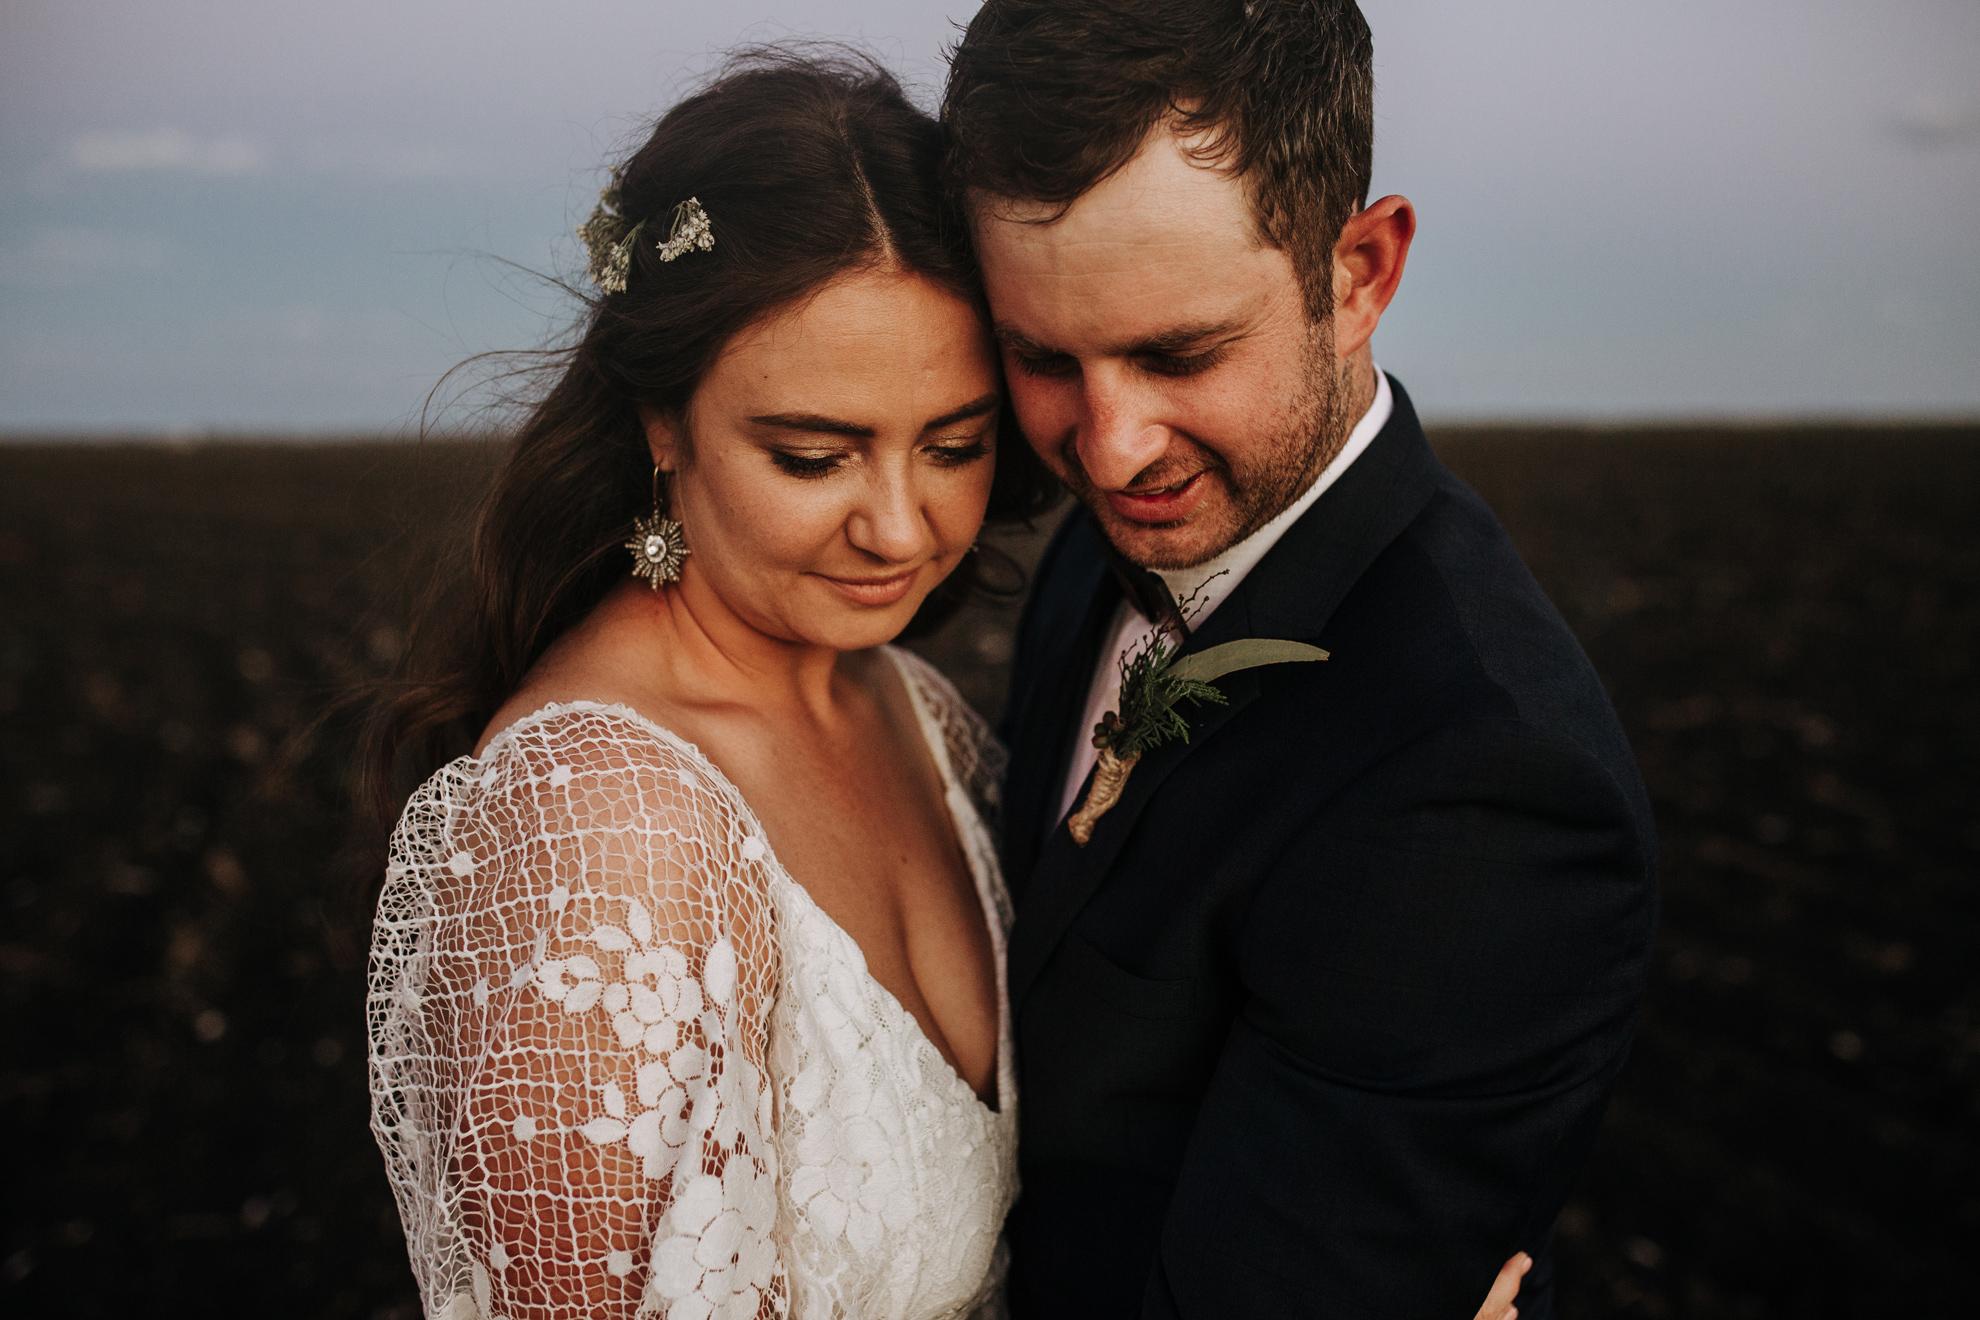 074-Jason_Jessie_Dalby_Country_Wedding.jpg